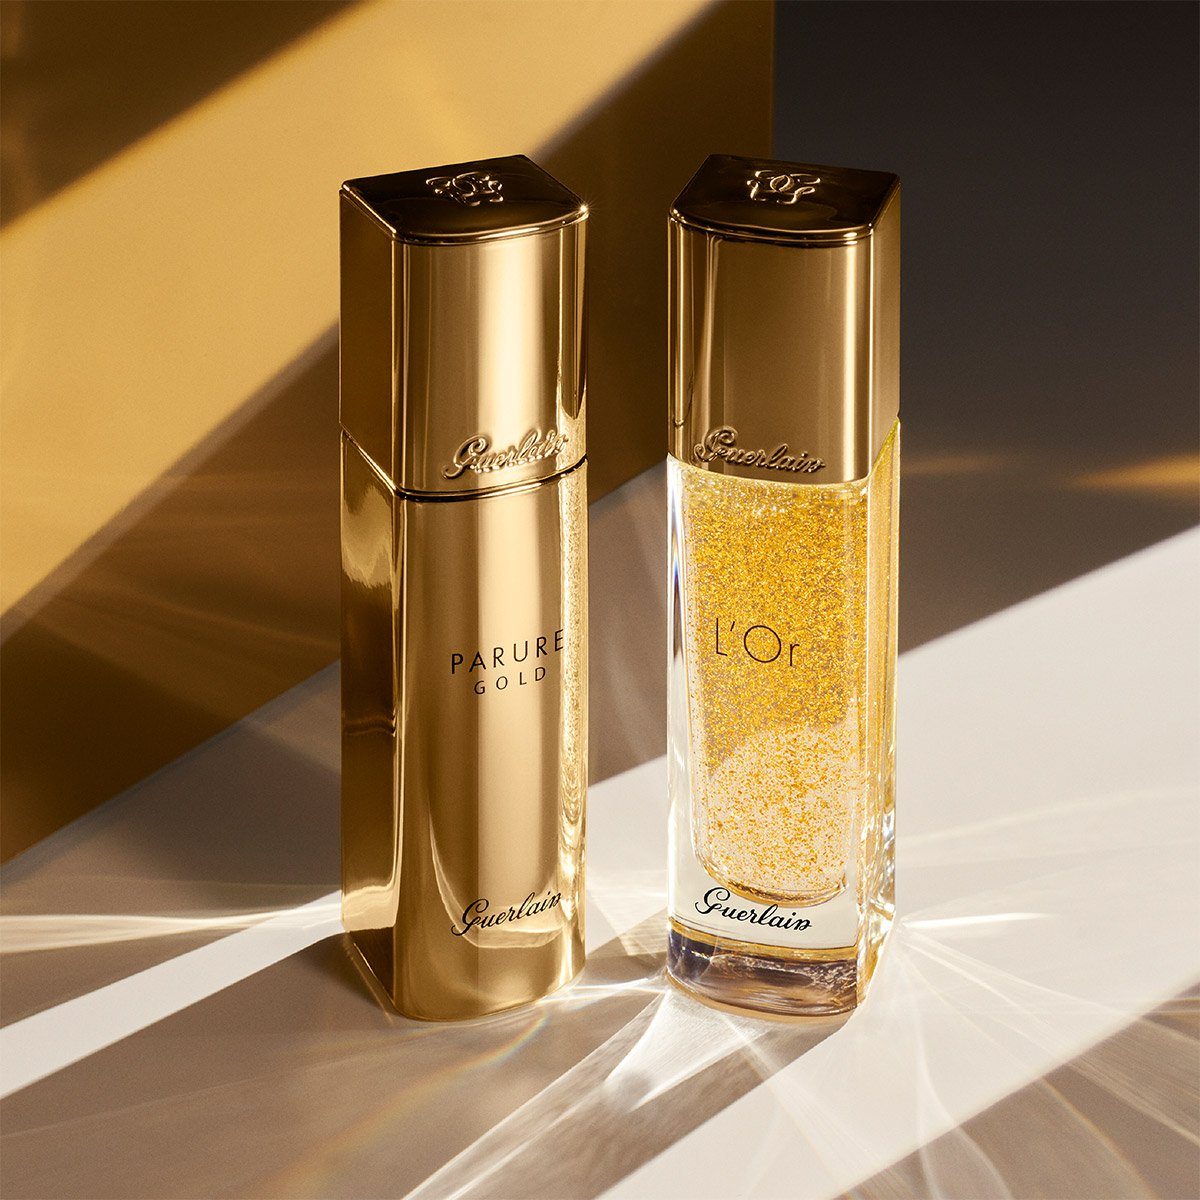 Base de Maquillaje Fluida Guerlain Parure Gold 04 Beige Moyen 30 Ml